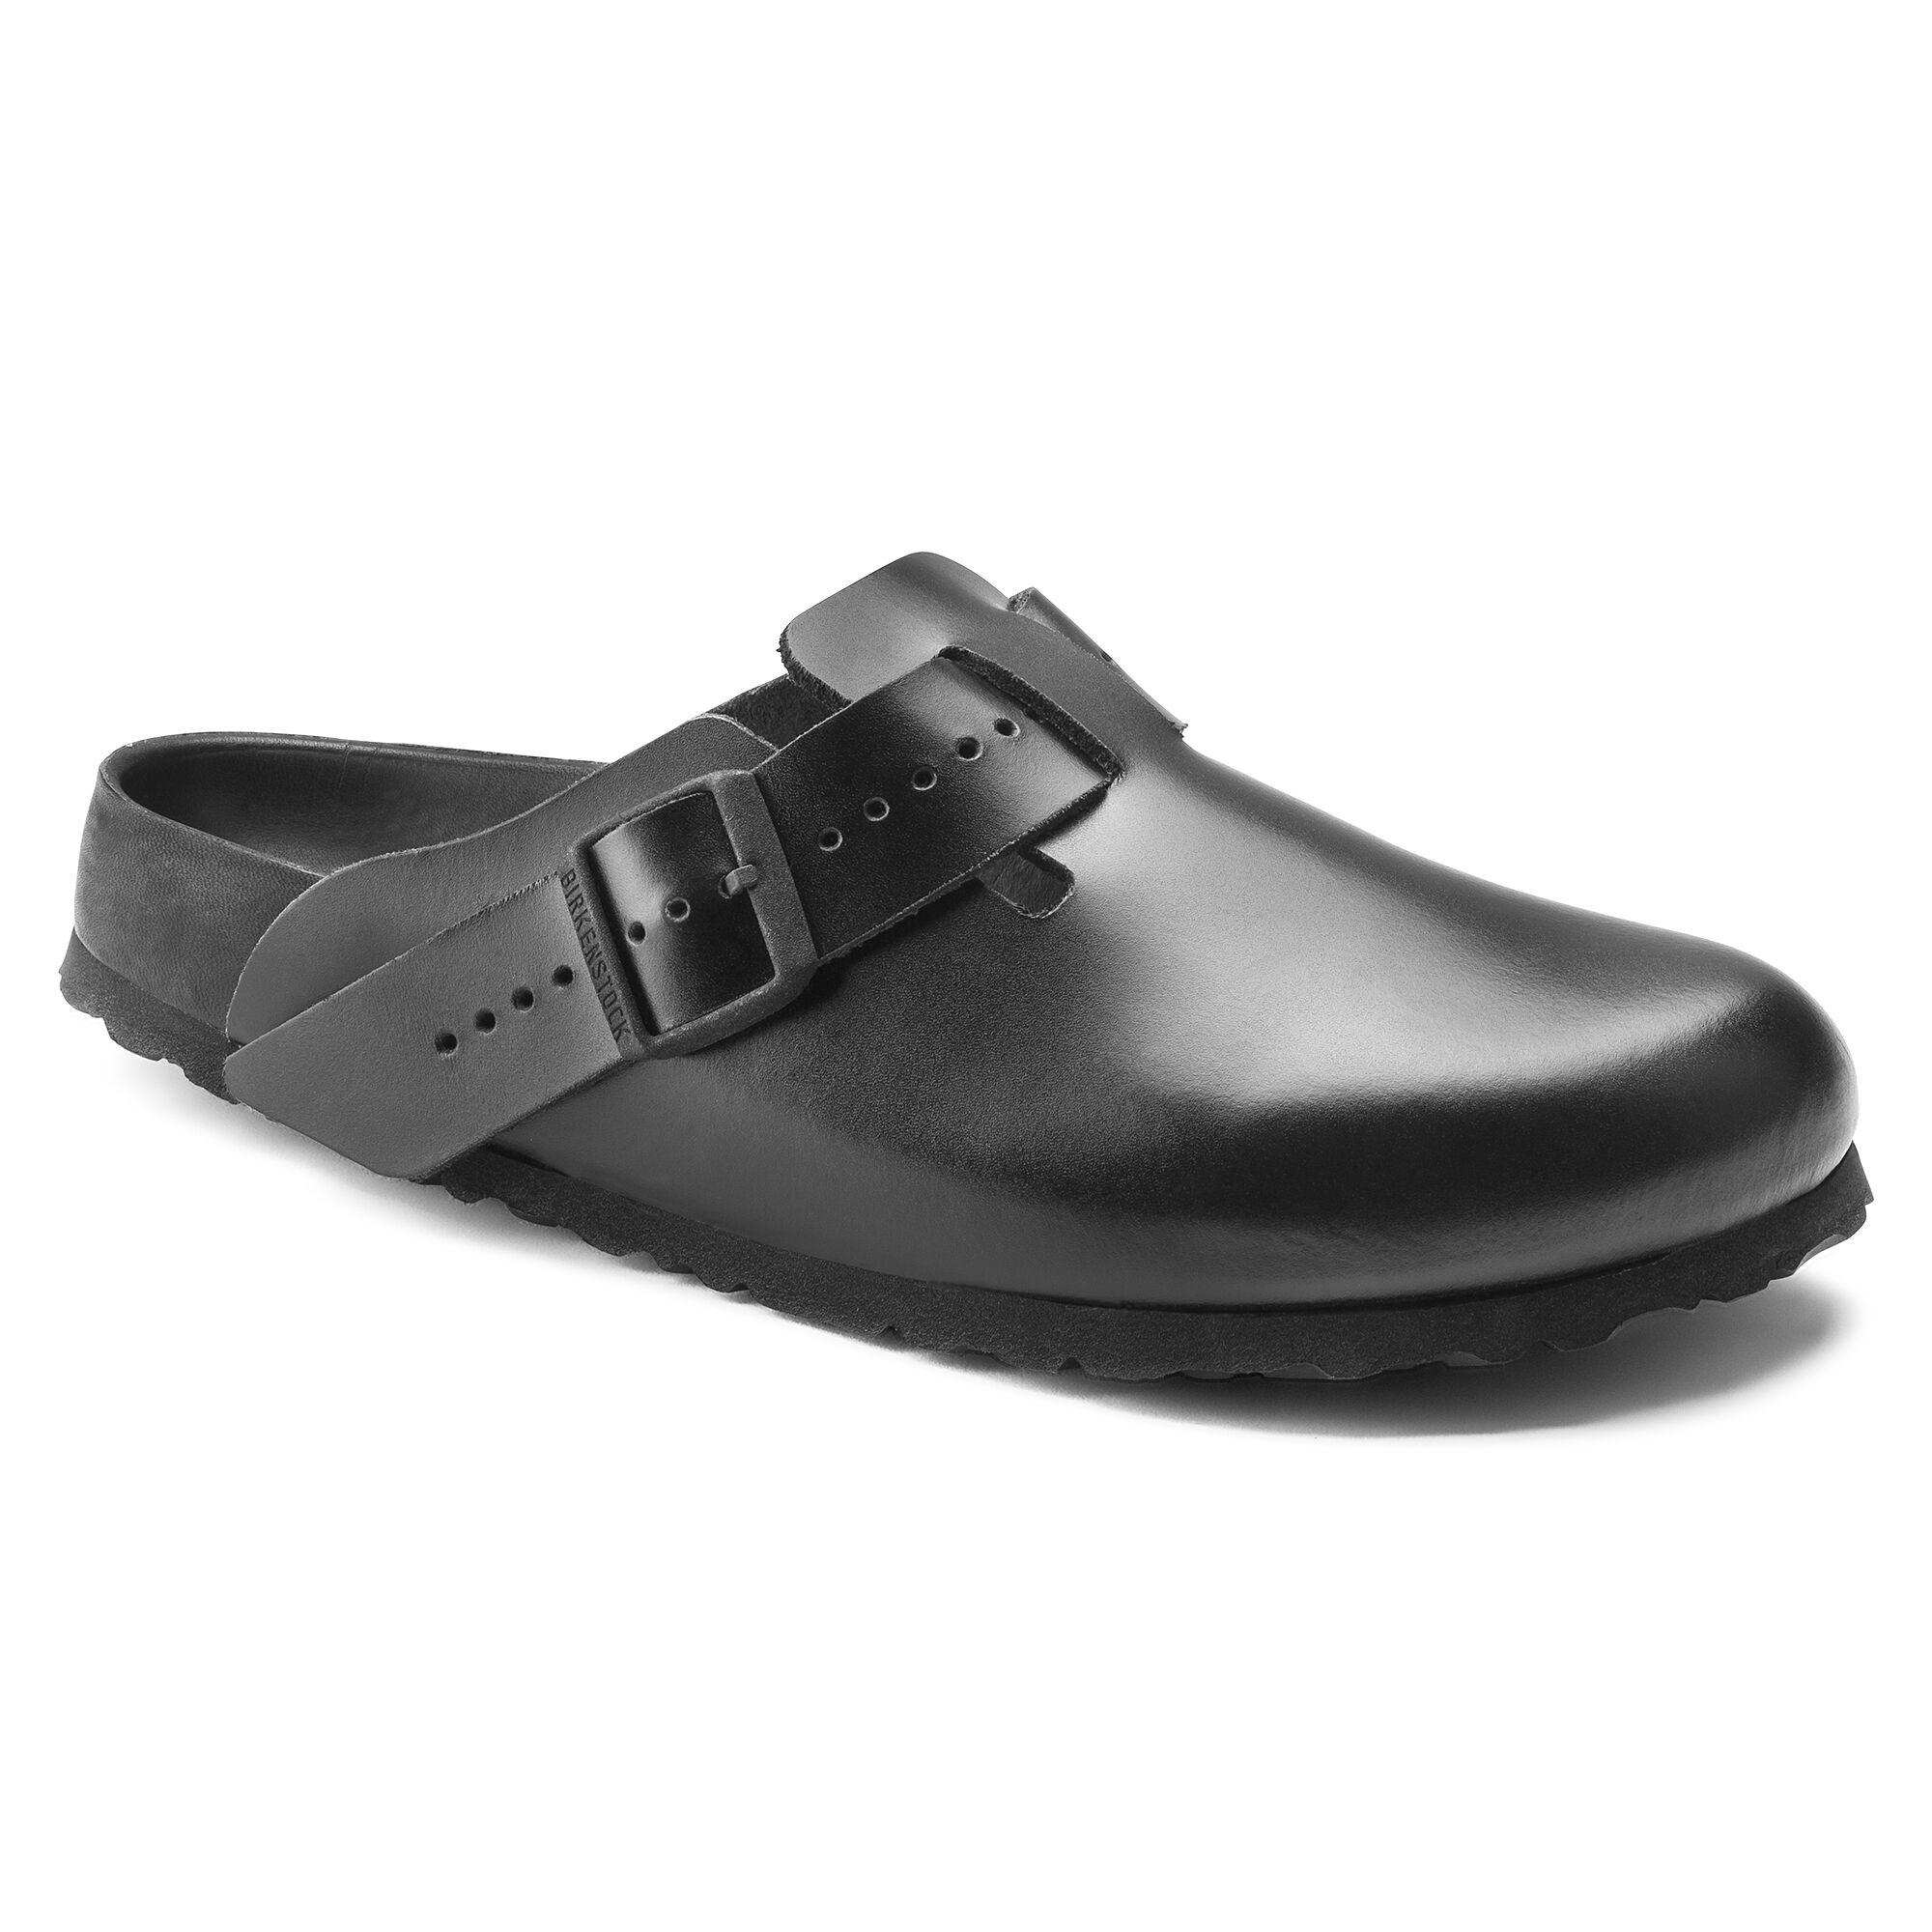 Rick OwensBoston birkenstock sandals 4yztWWpQL